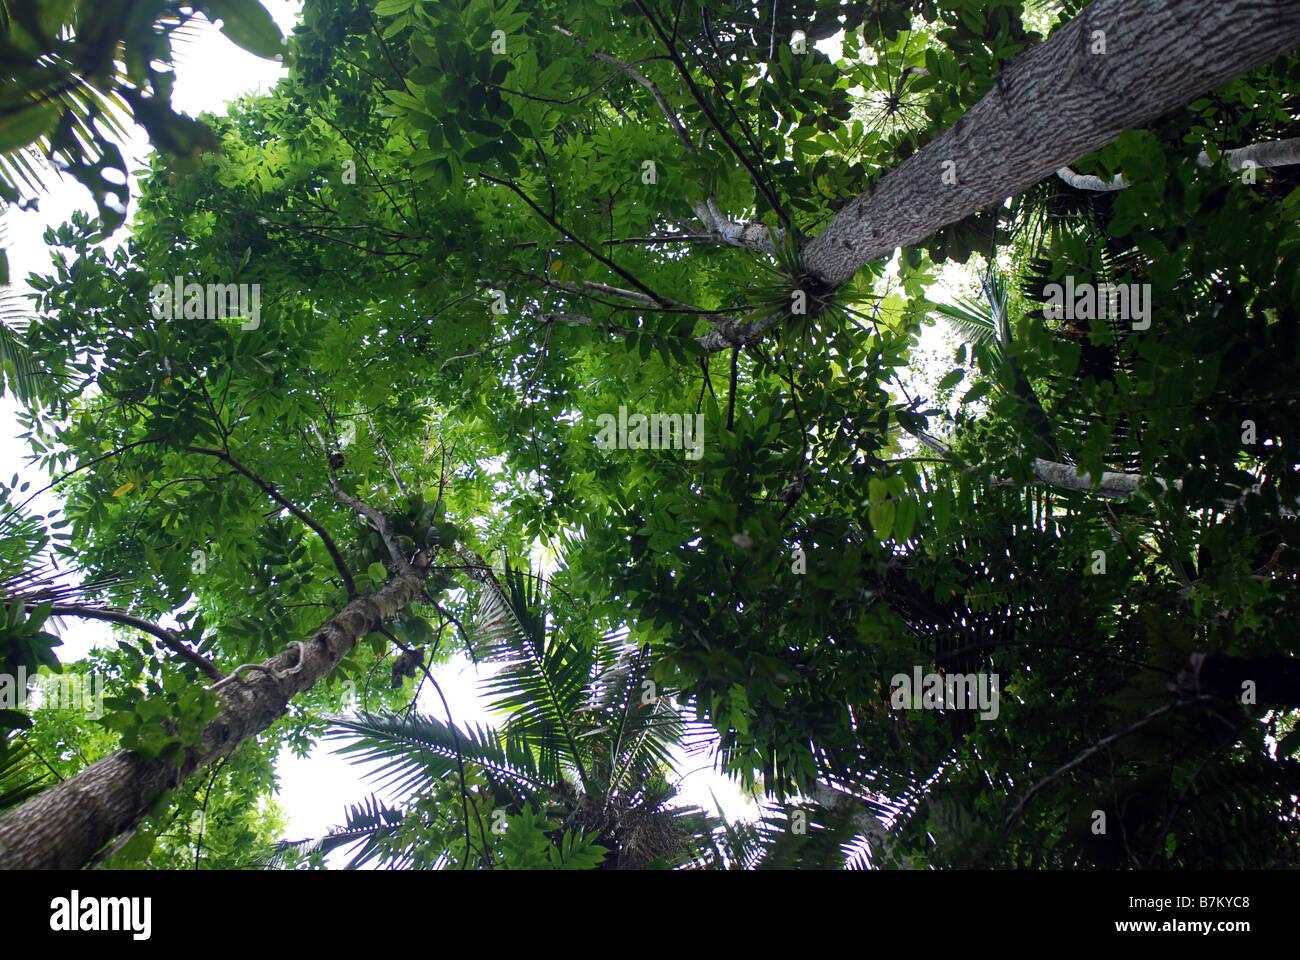 Mahagonibäume  Mahagonibäume, Las Casas De La Selva, Patillas, Puerto Rico ...